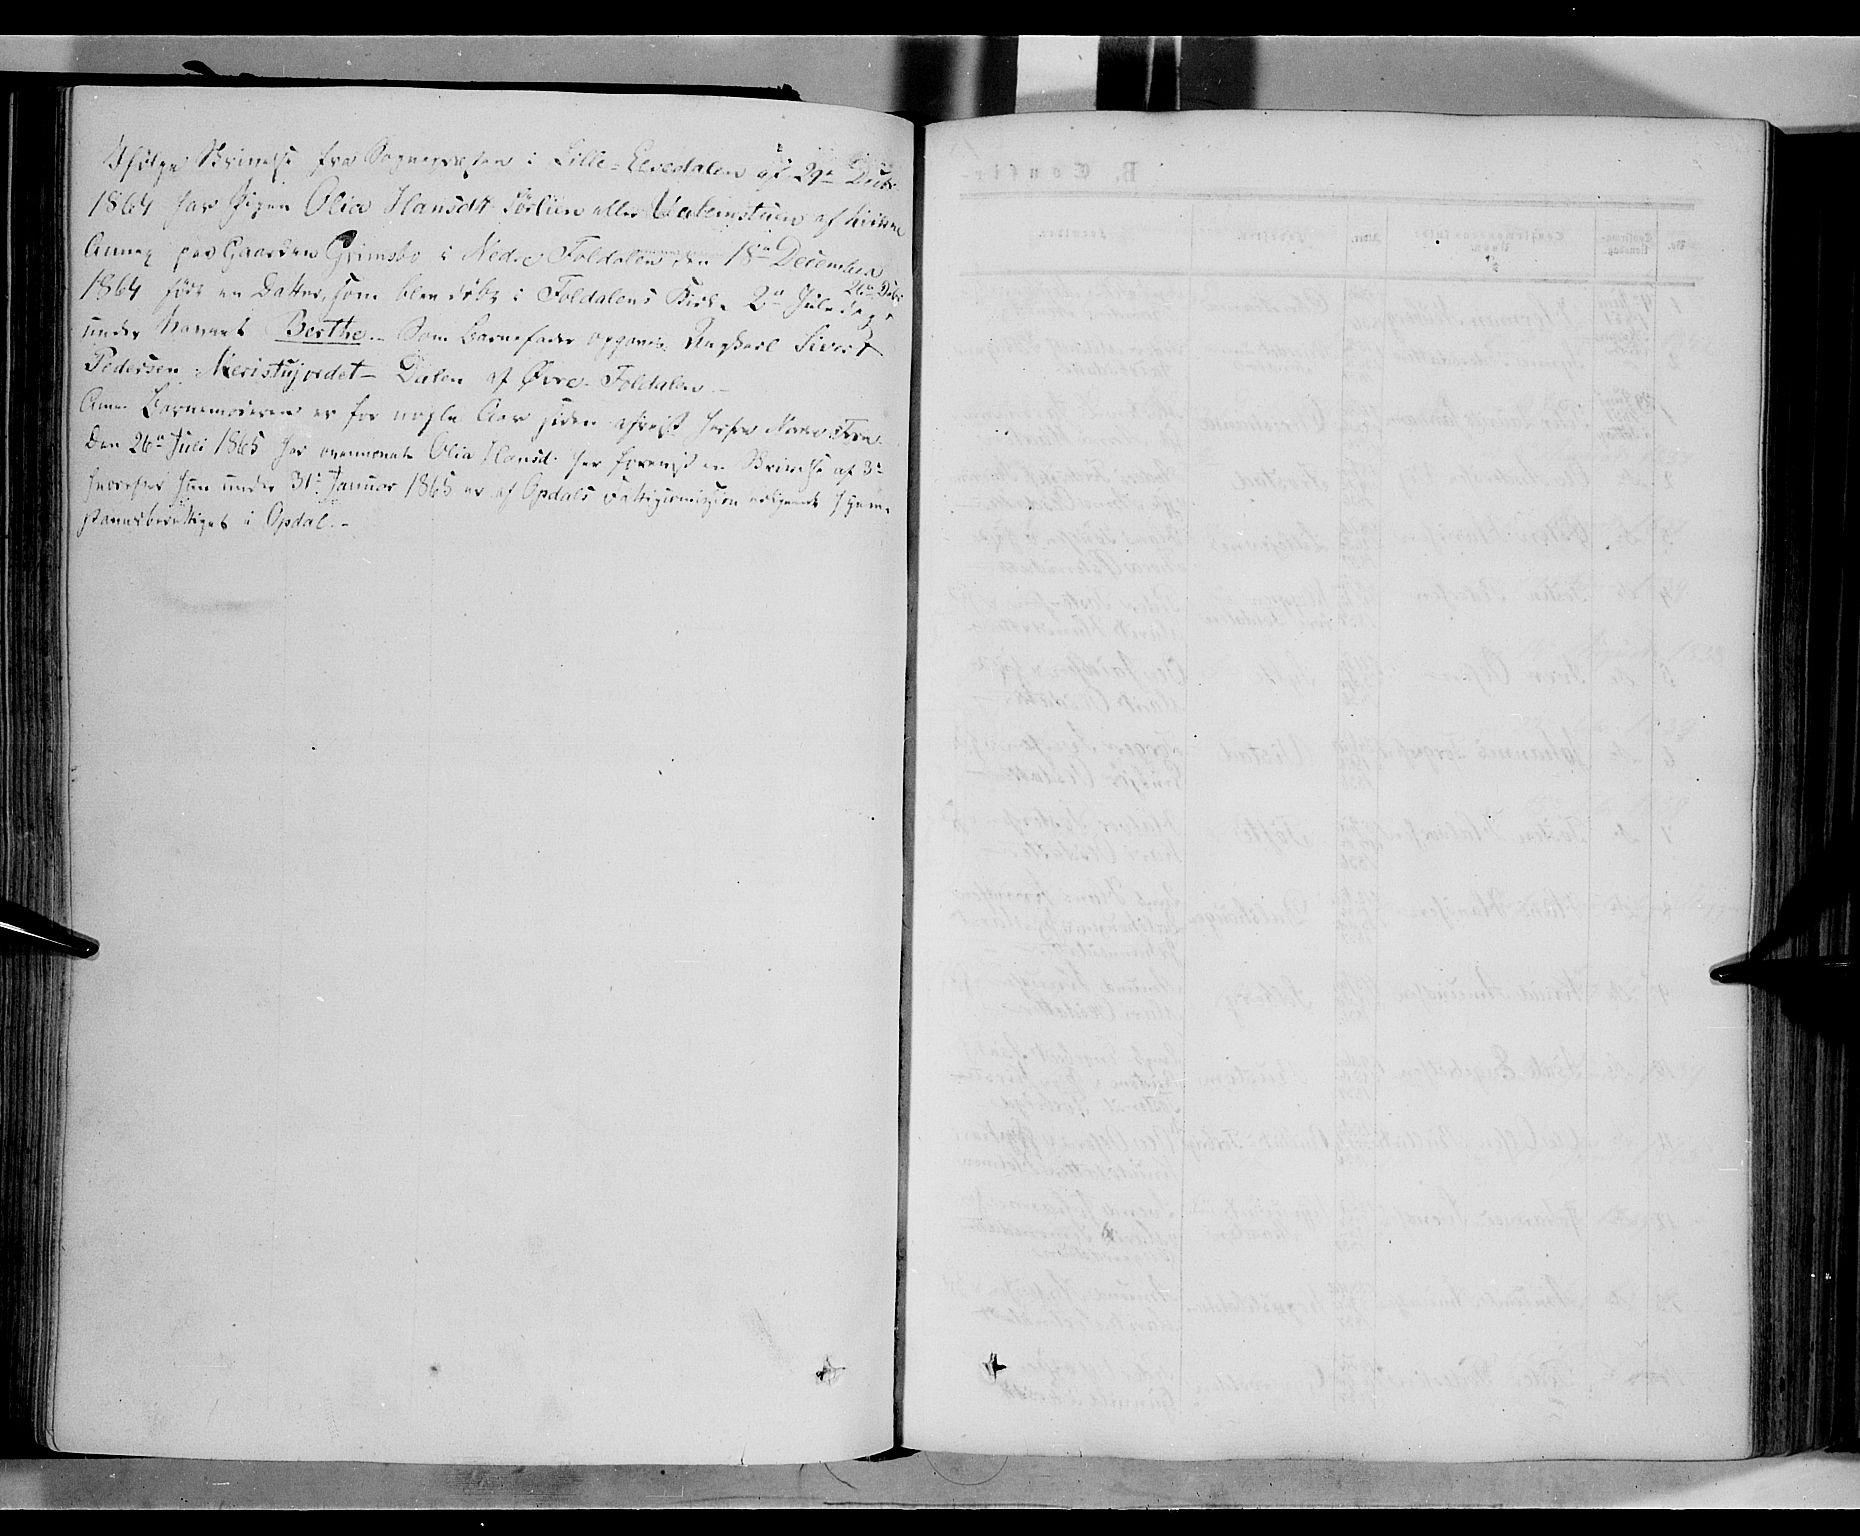 SAH, Nord-Fron prestekontor, Ministerialbok nr. 1, 1851-1864, s. 153b